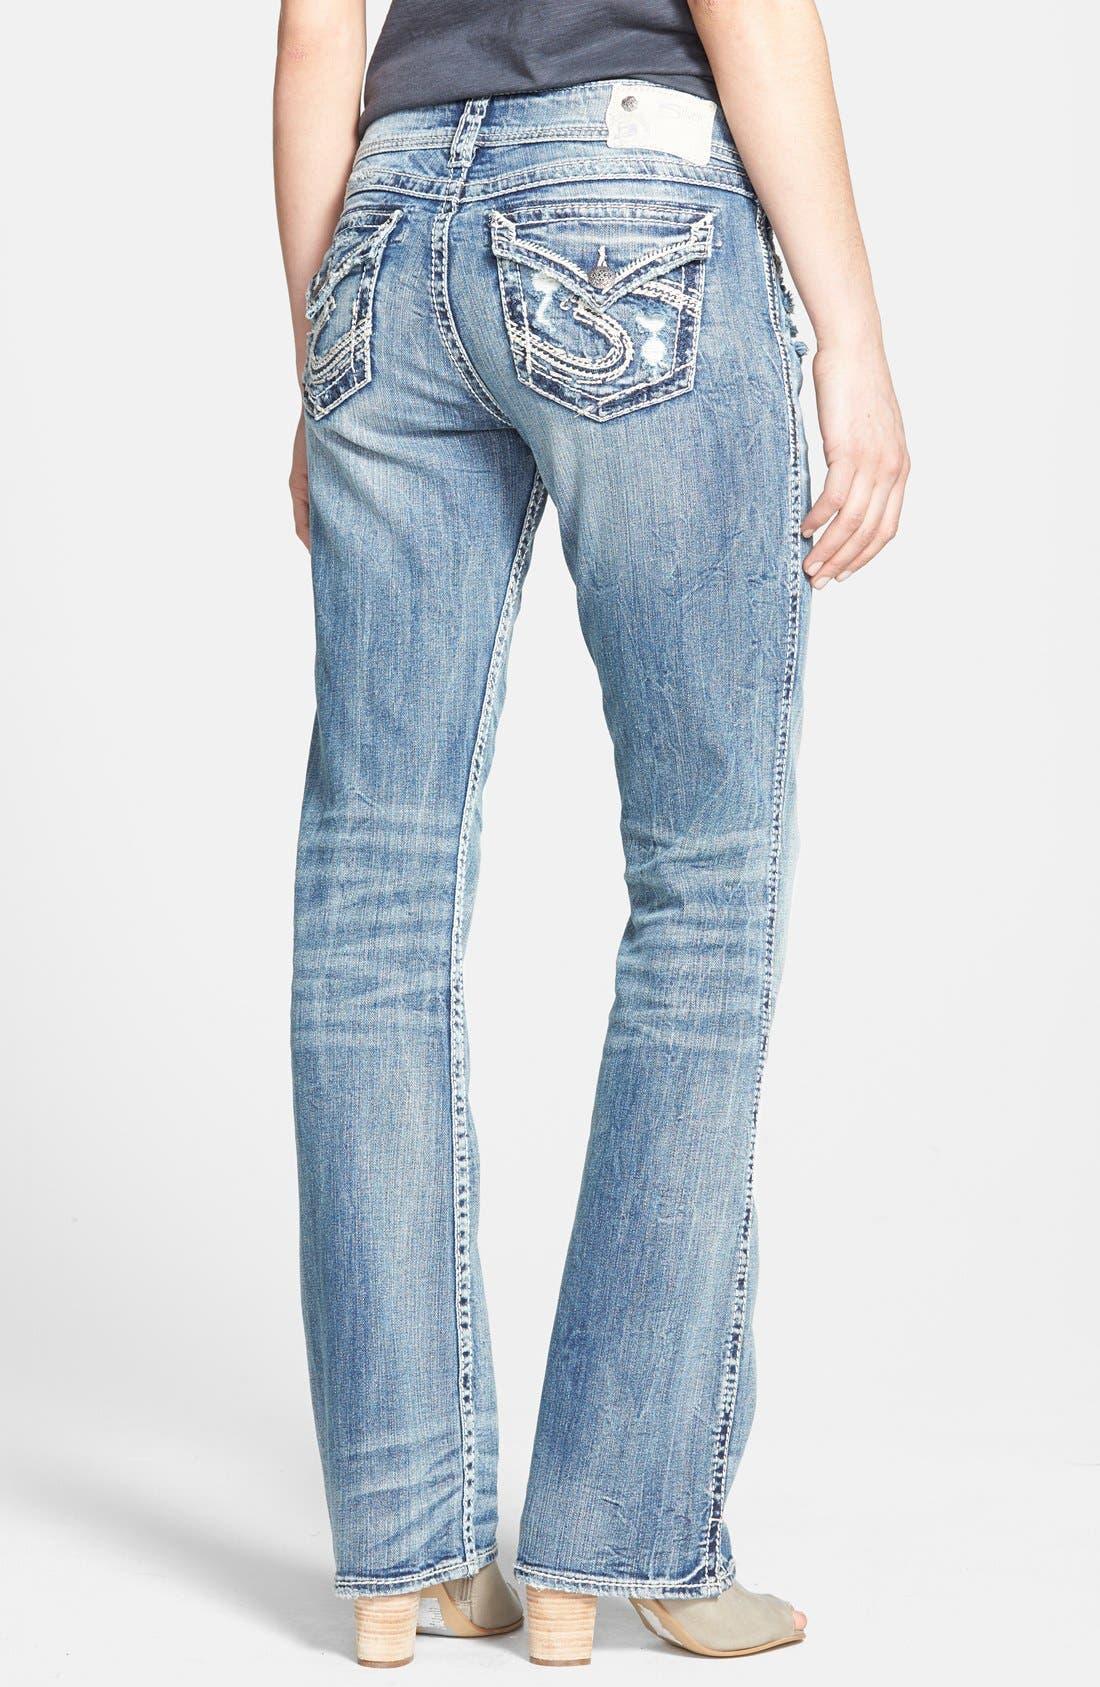 Alternate Image 2  - Silver Jeans Co. 'Suki' Distressed Flap Pocket Slim Bootcut Jeans (Indigo)